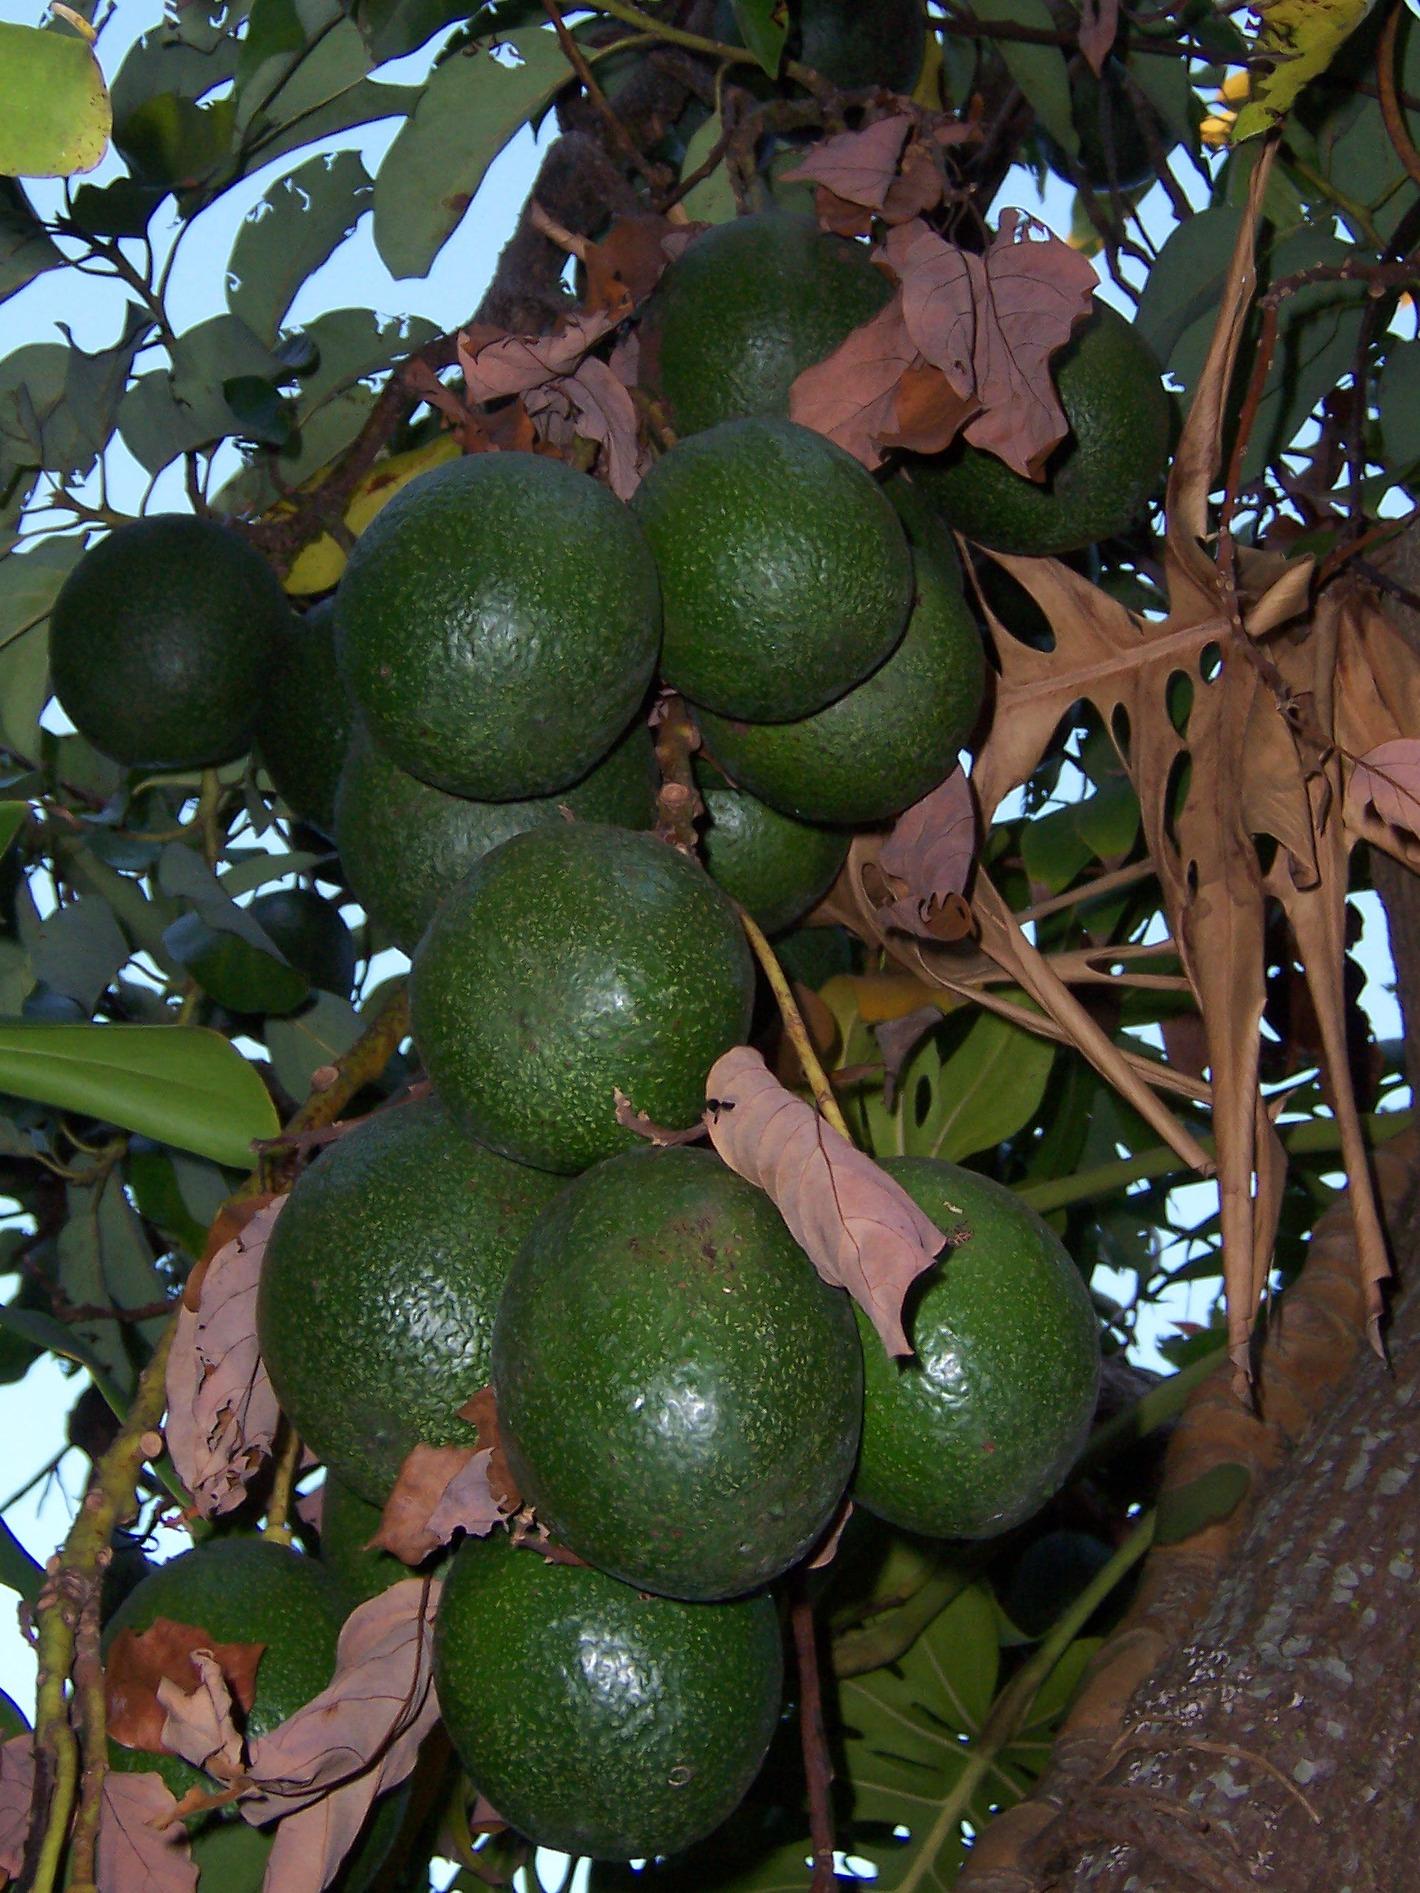 fichier:persea americana fruits 2 — wikipédia